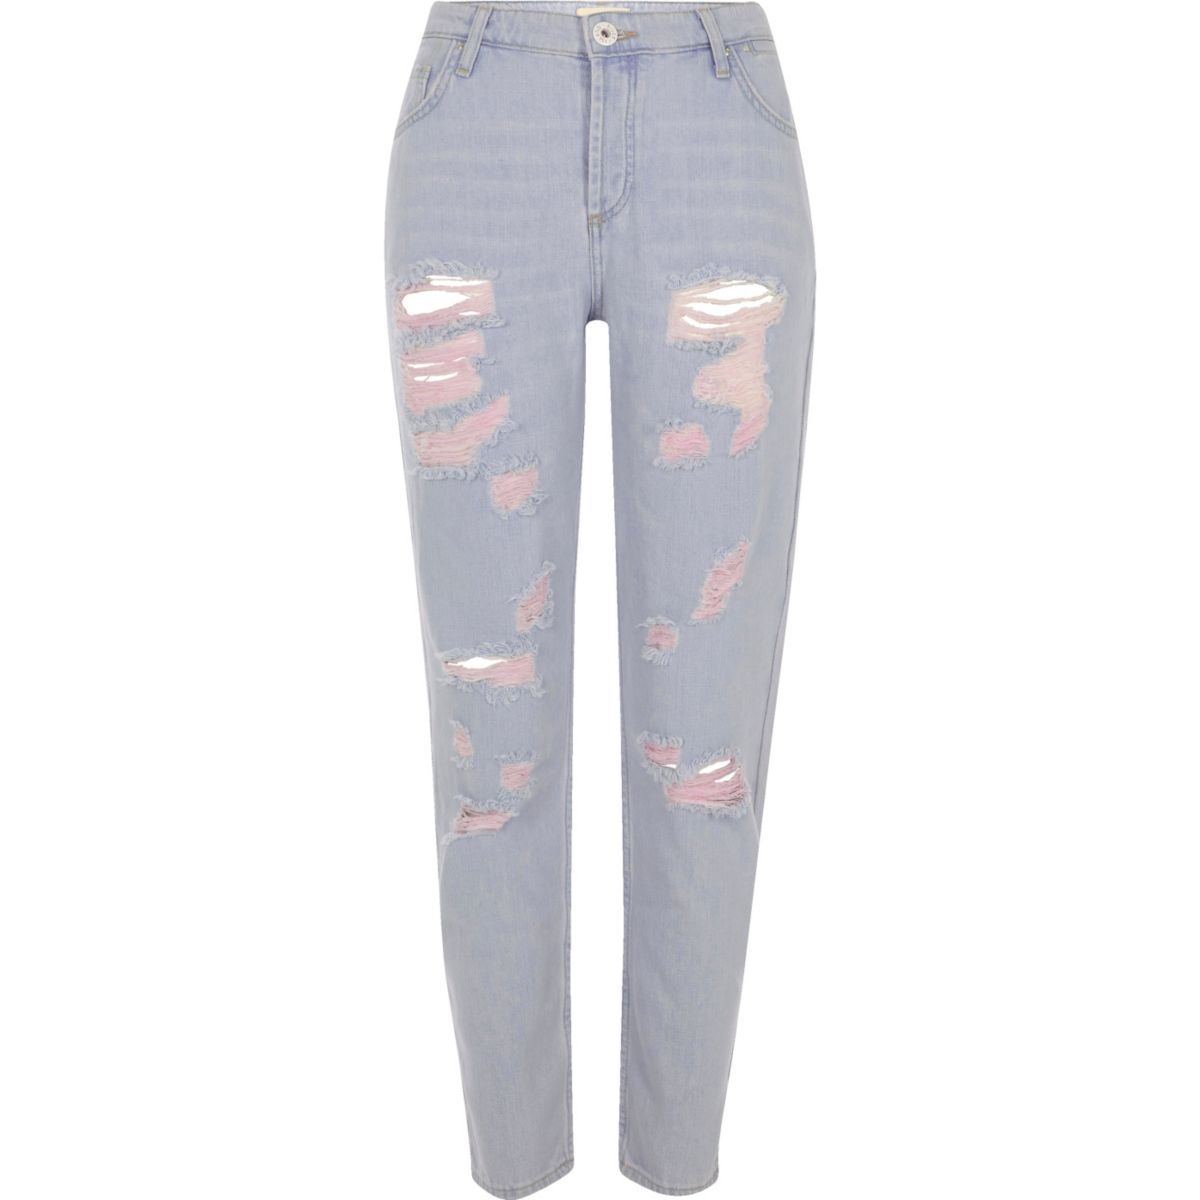 Blue denim pink tint ripped boyfriend jeans